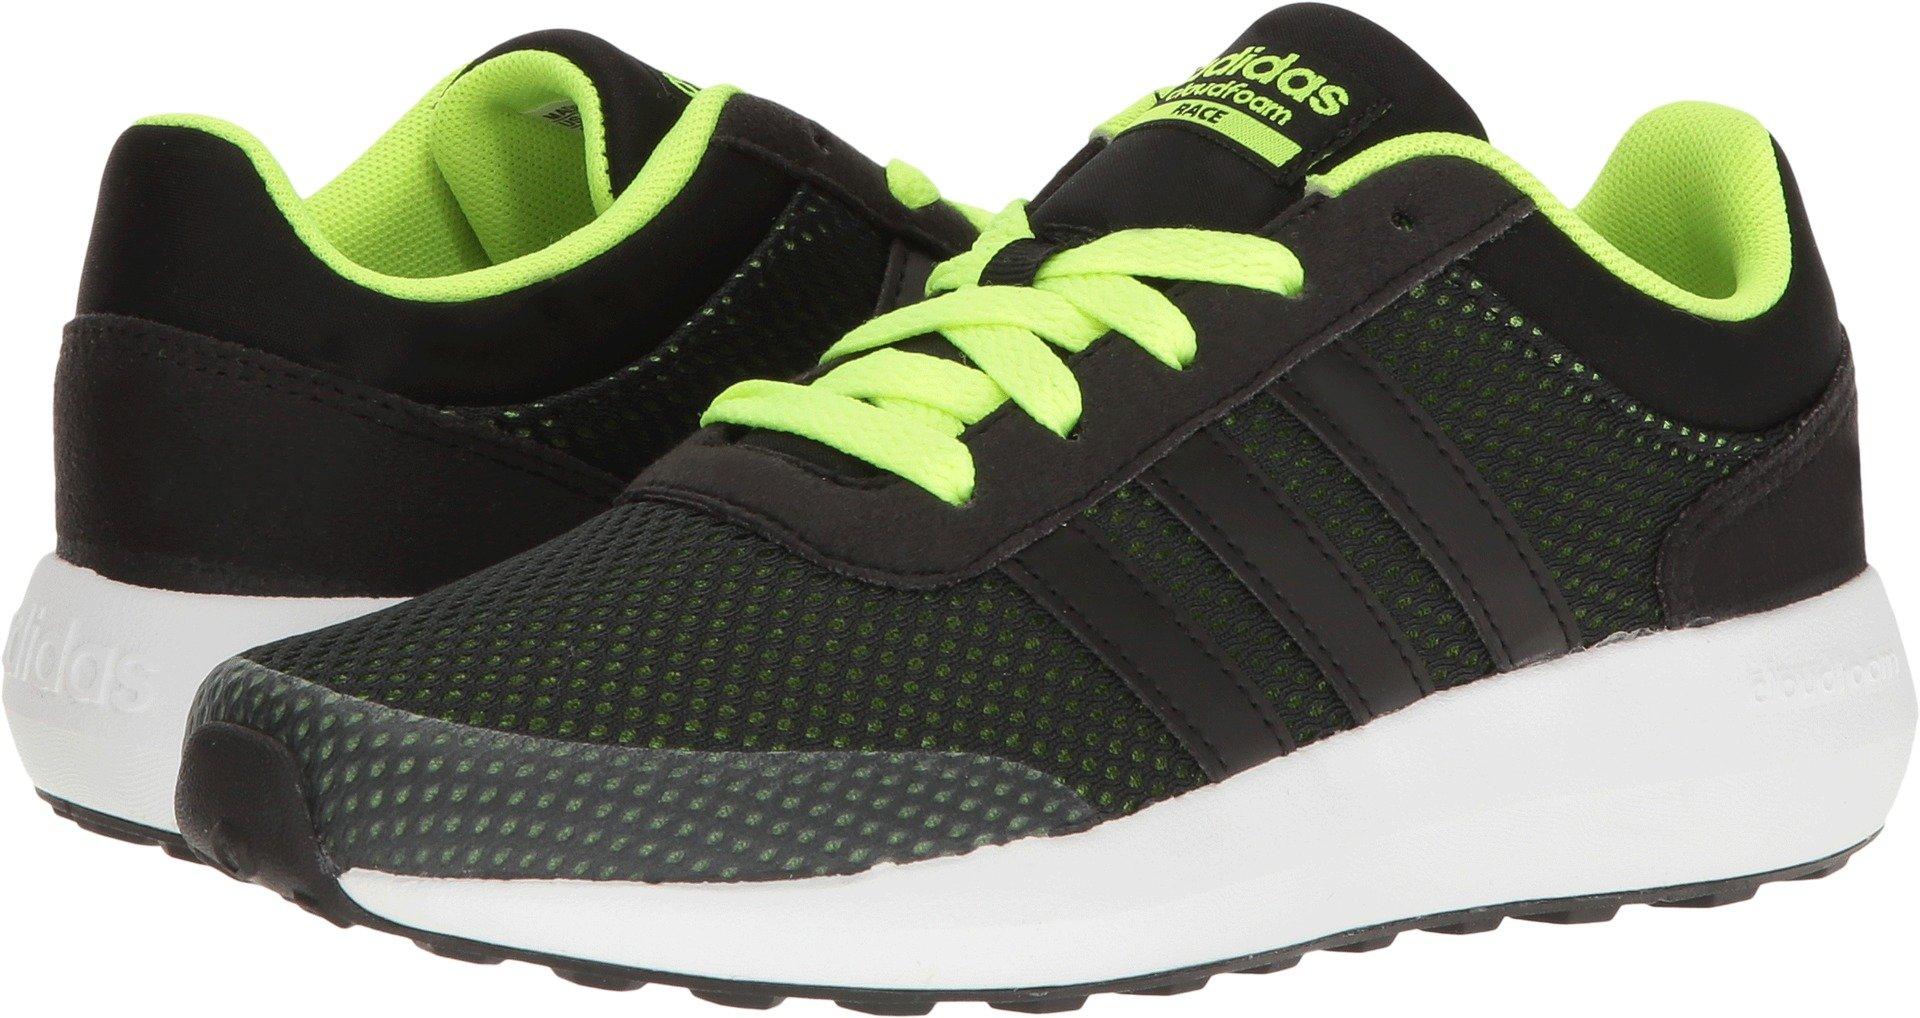 adidas Cloudfoam Race (Big) Sneaker, Black/Solar Yellow, 11.5 Little Kid M